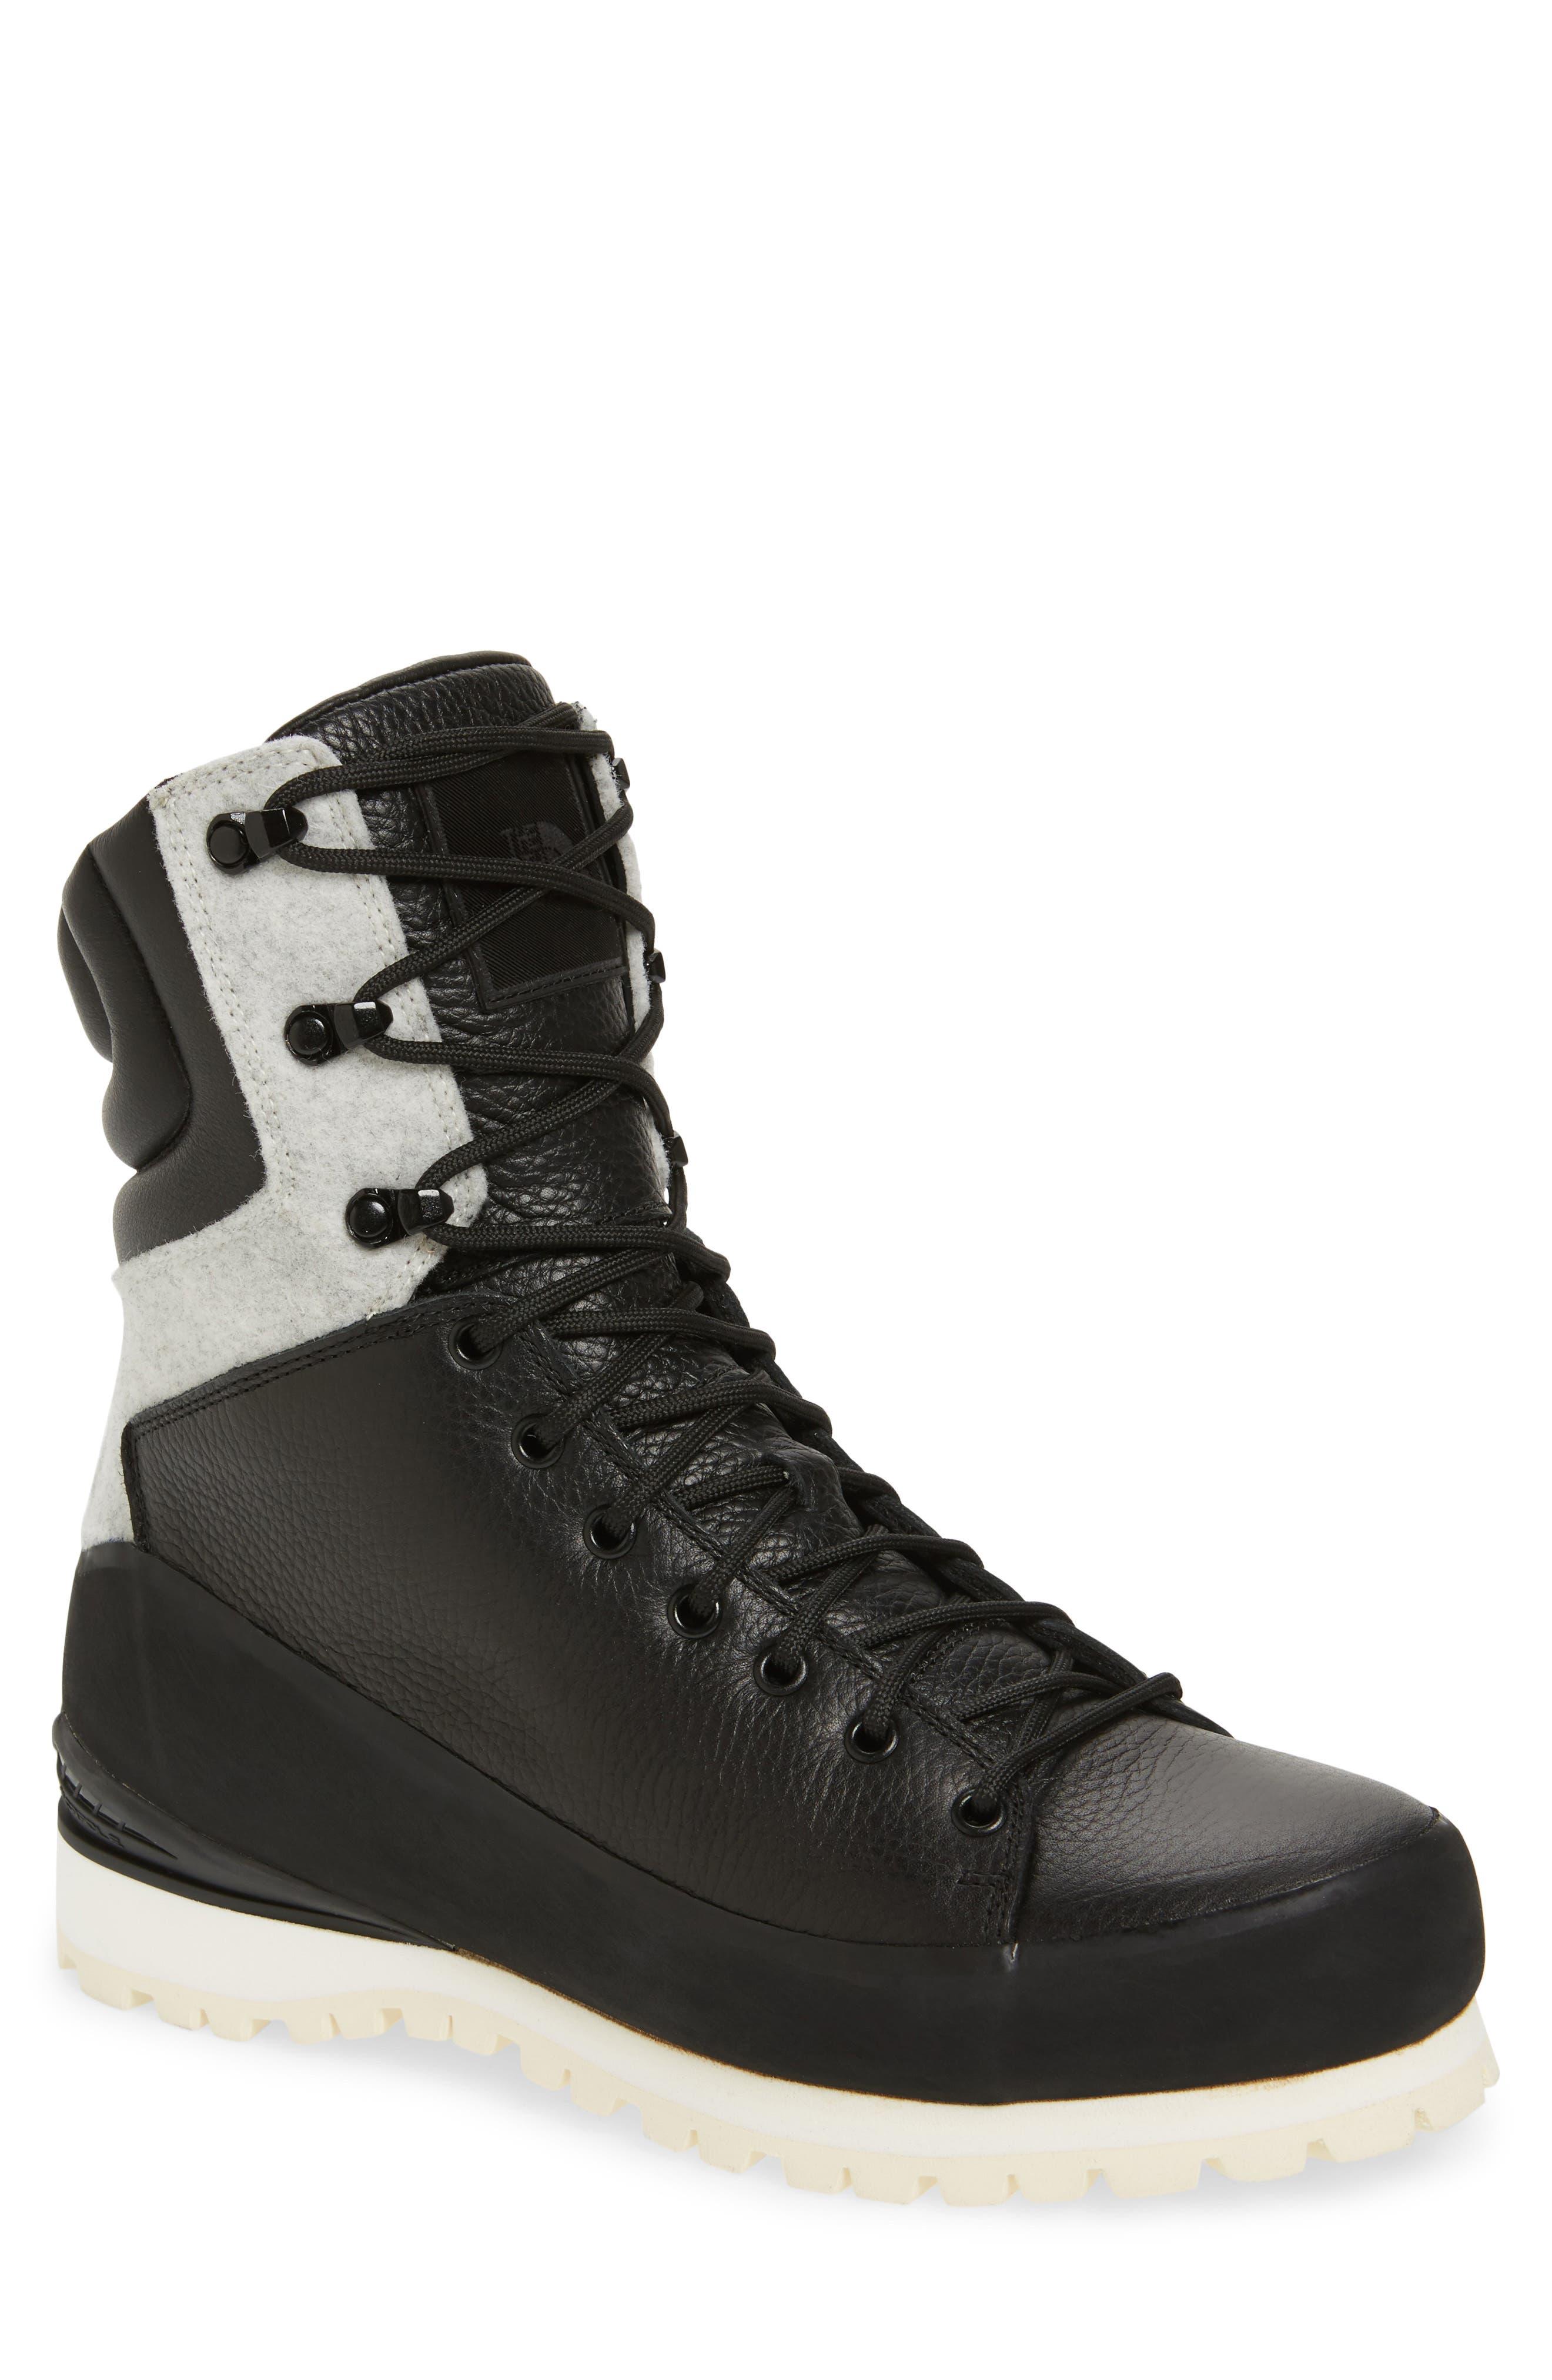 Cryos Boot,                             Main thumbnail 1, color,                             TNF BLACK/ GLACIER WHITE